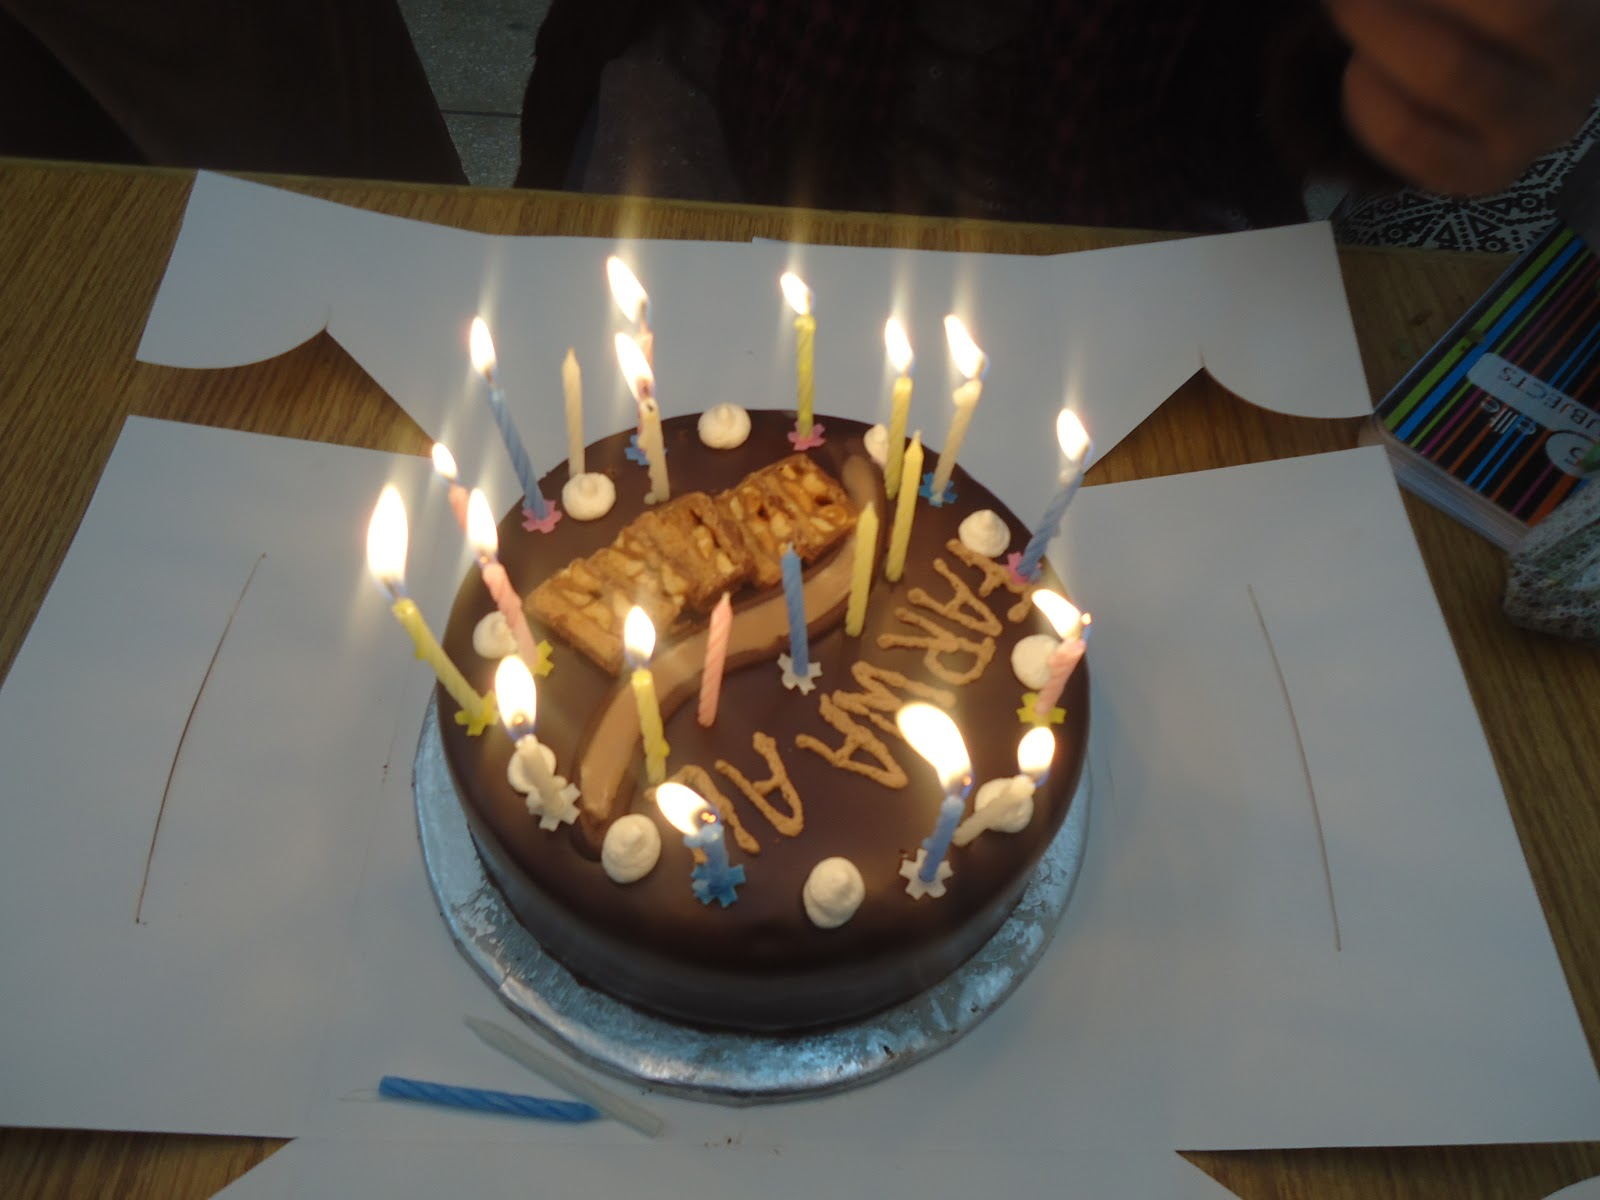 Birthday Cake Pics With Name Ali : Farwa ALi birthday ~ AMNA ZAFAR (AIMZ)